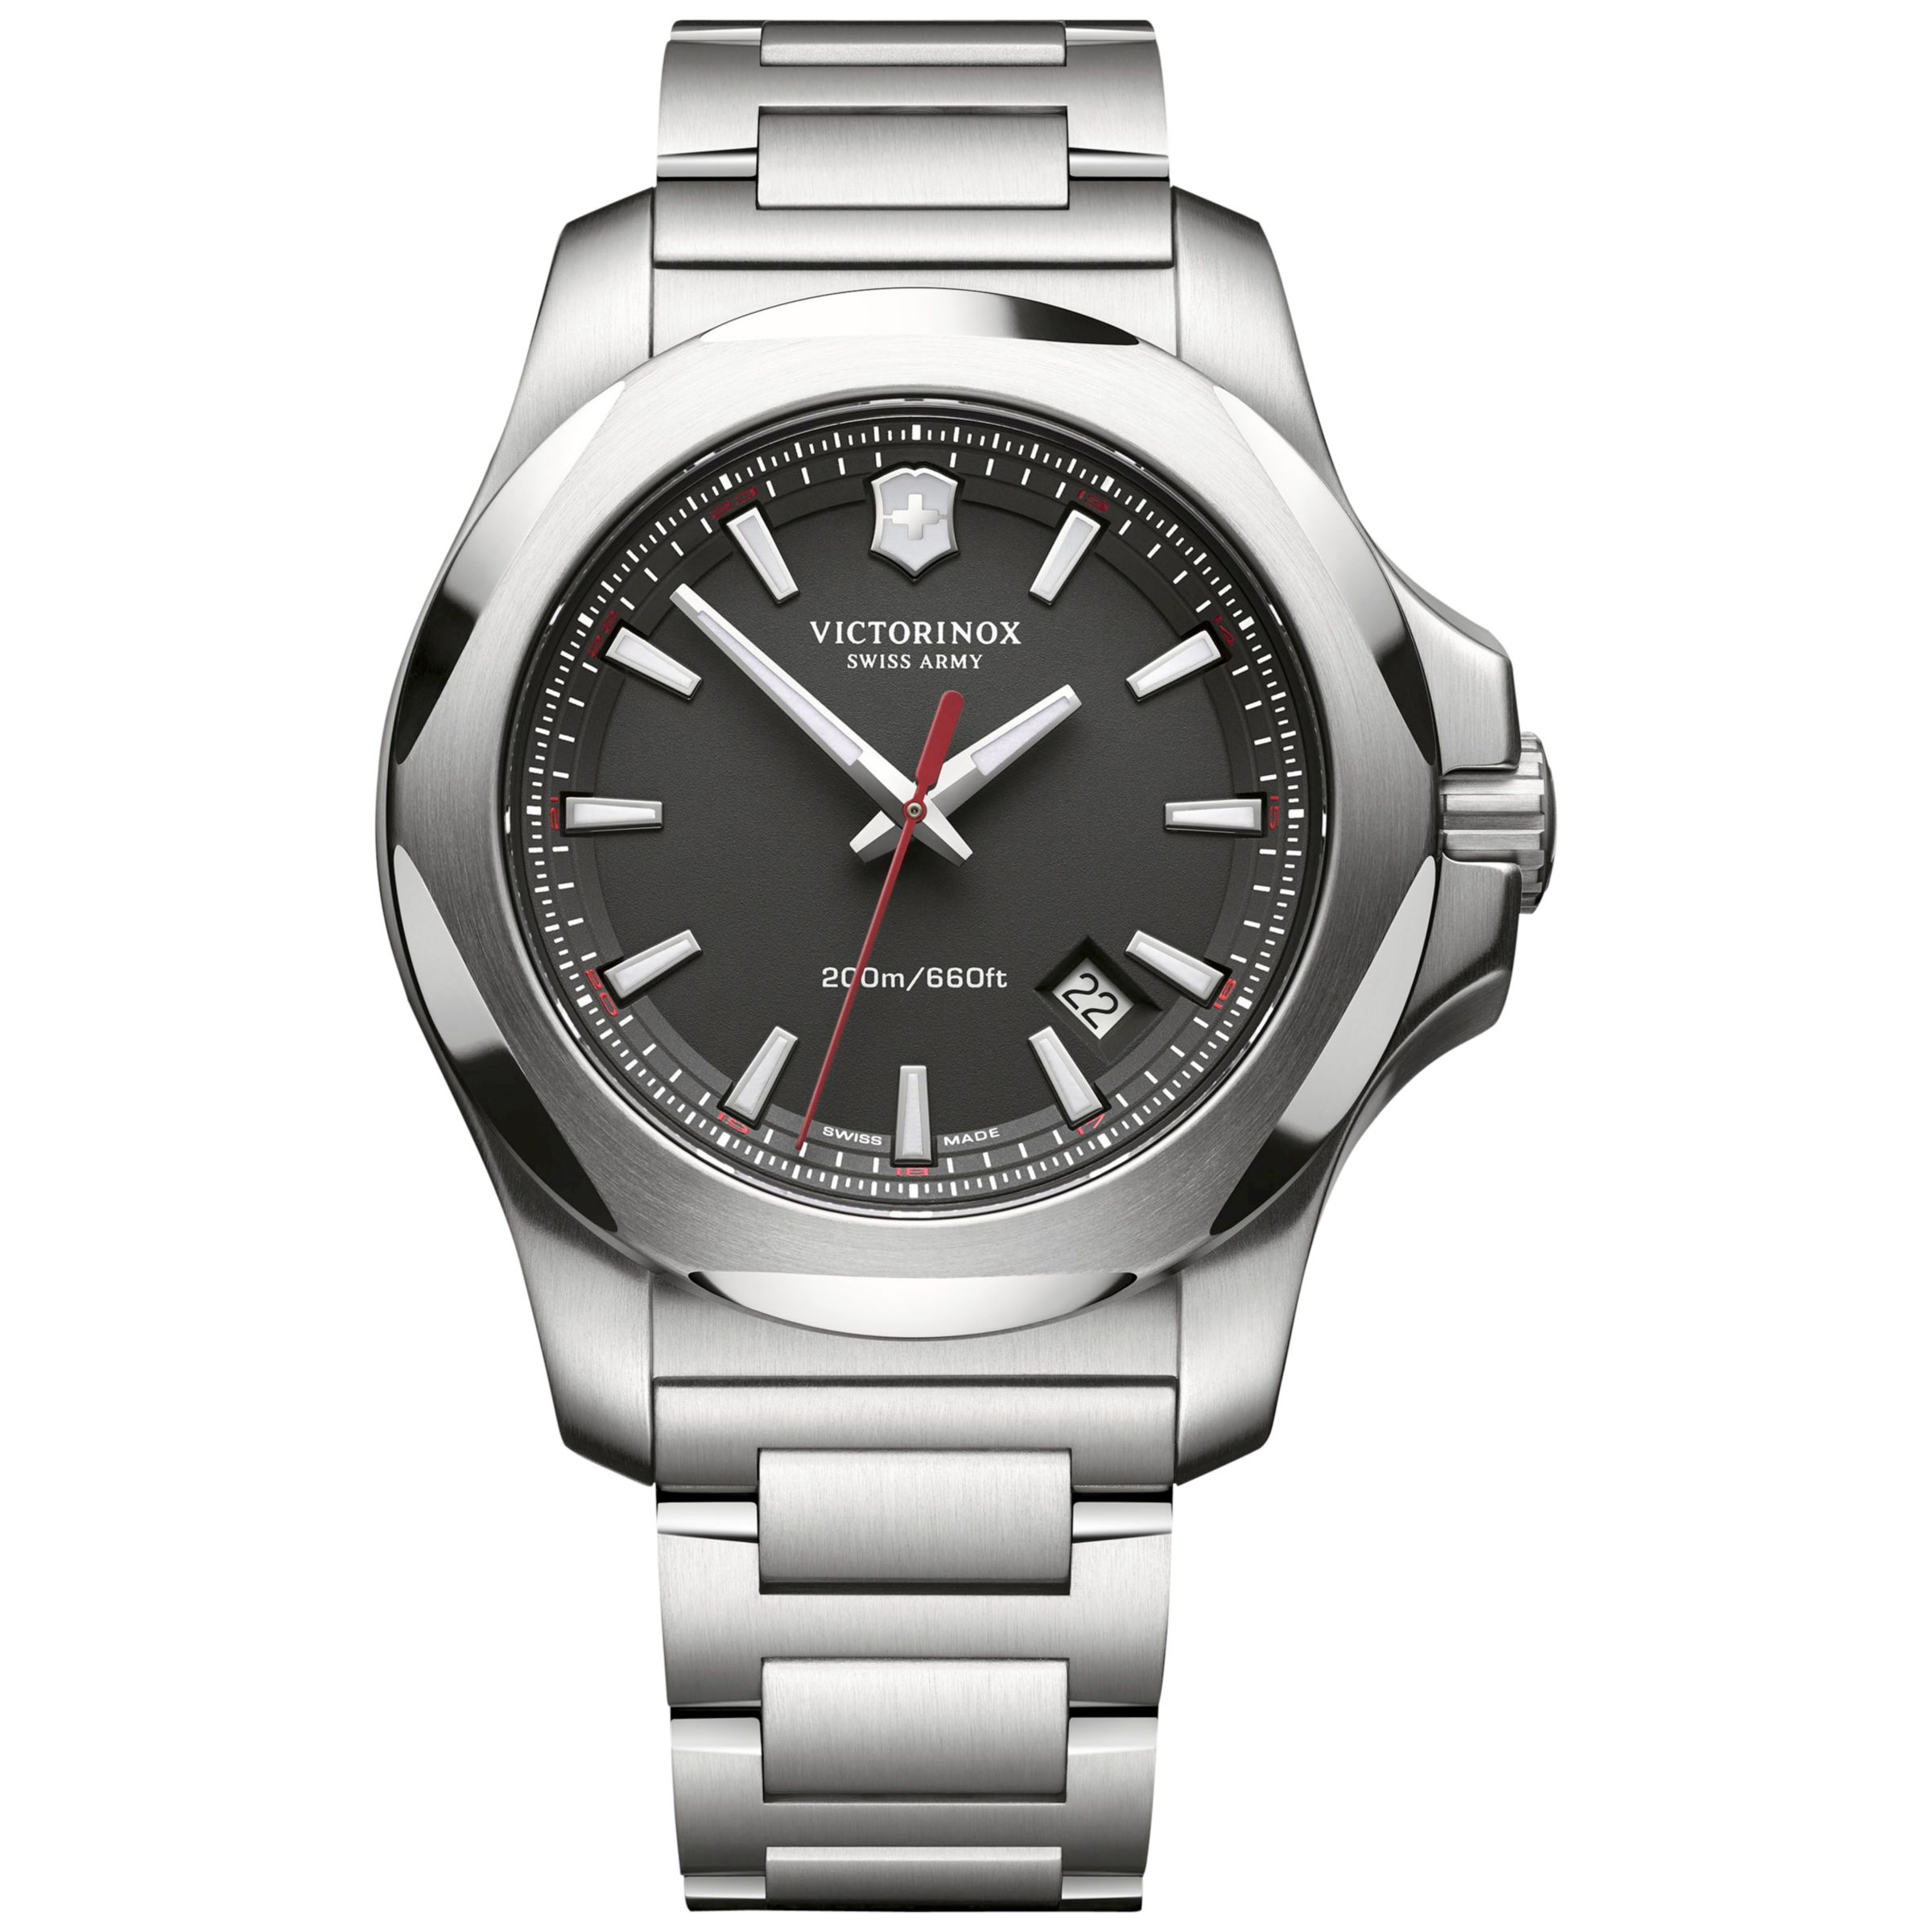 Victorinox Victorinox Men's I.N.O.X Date Bracelet Strap Watch